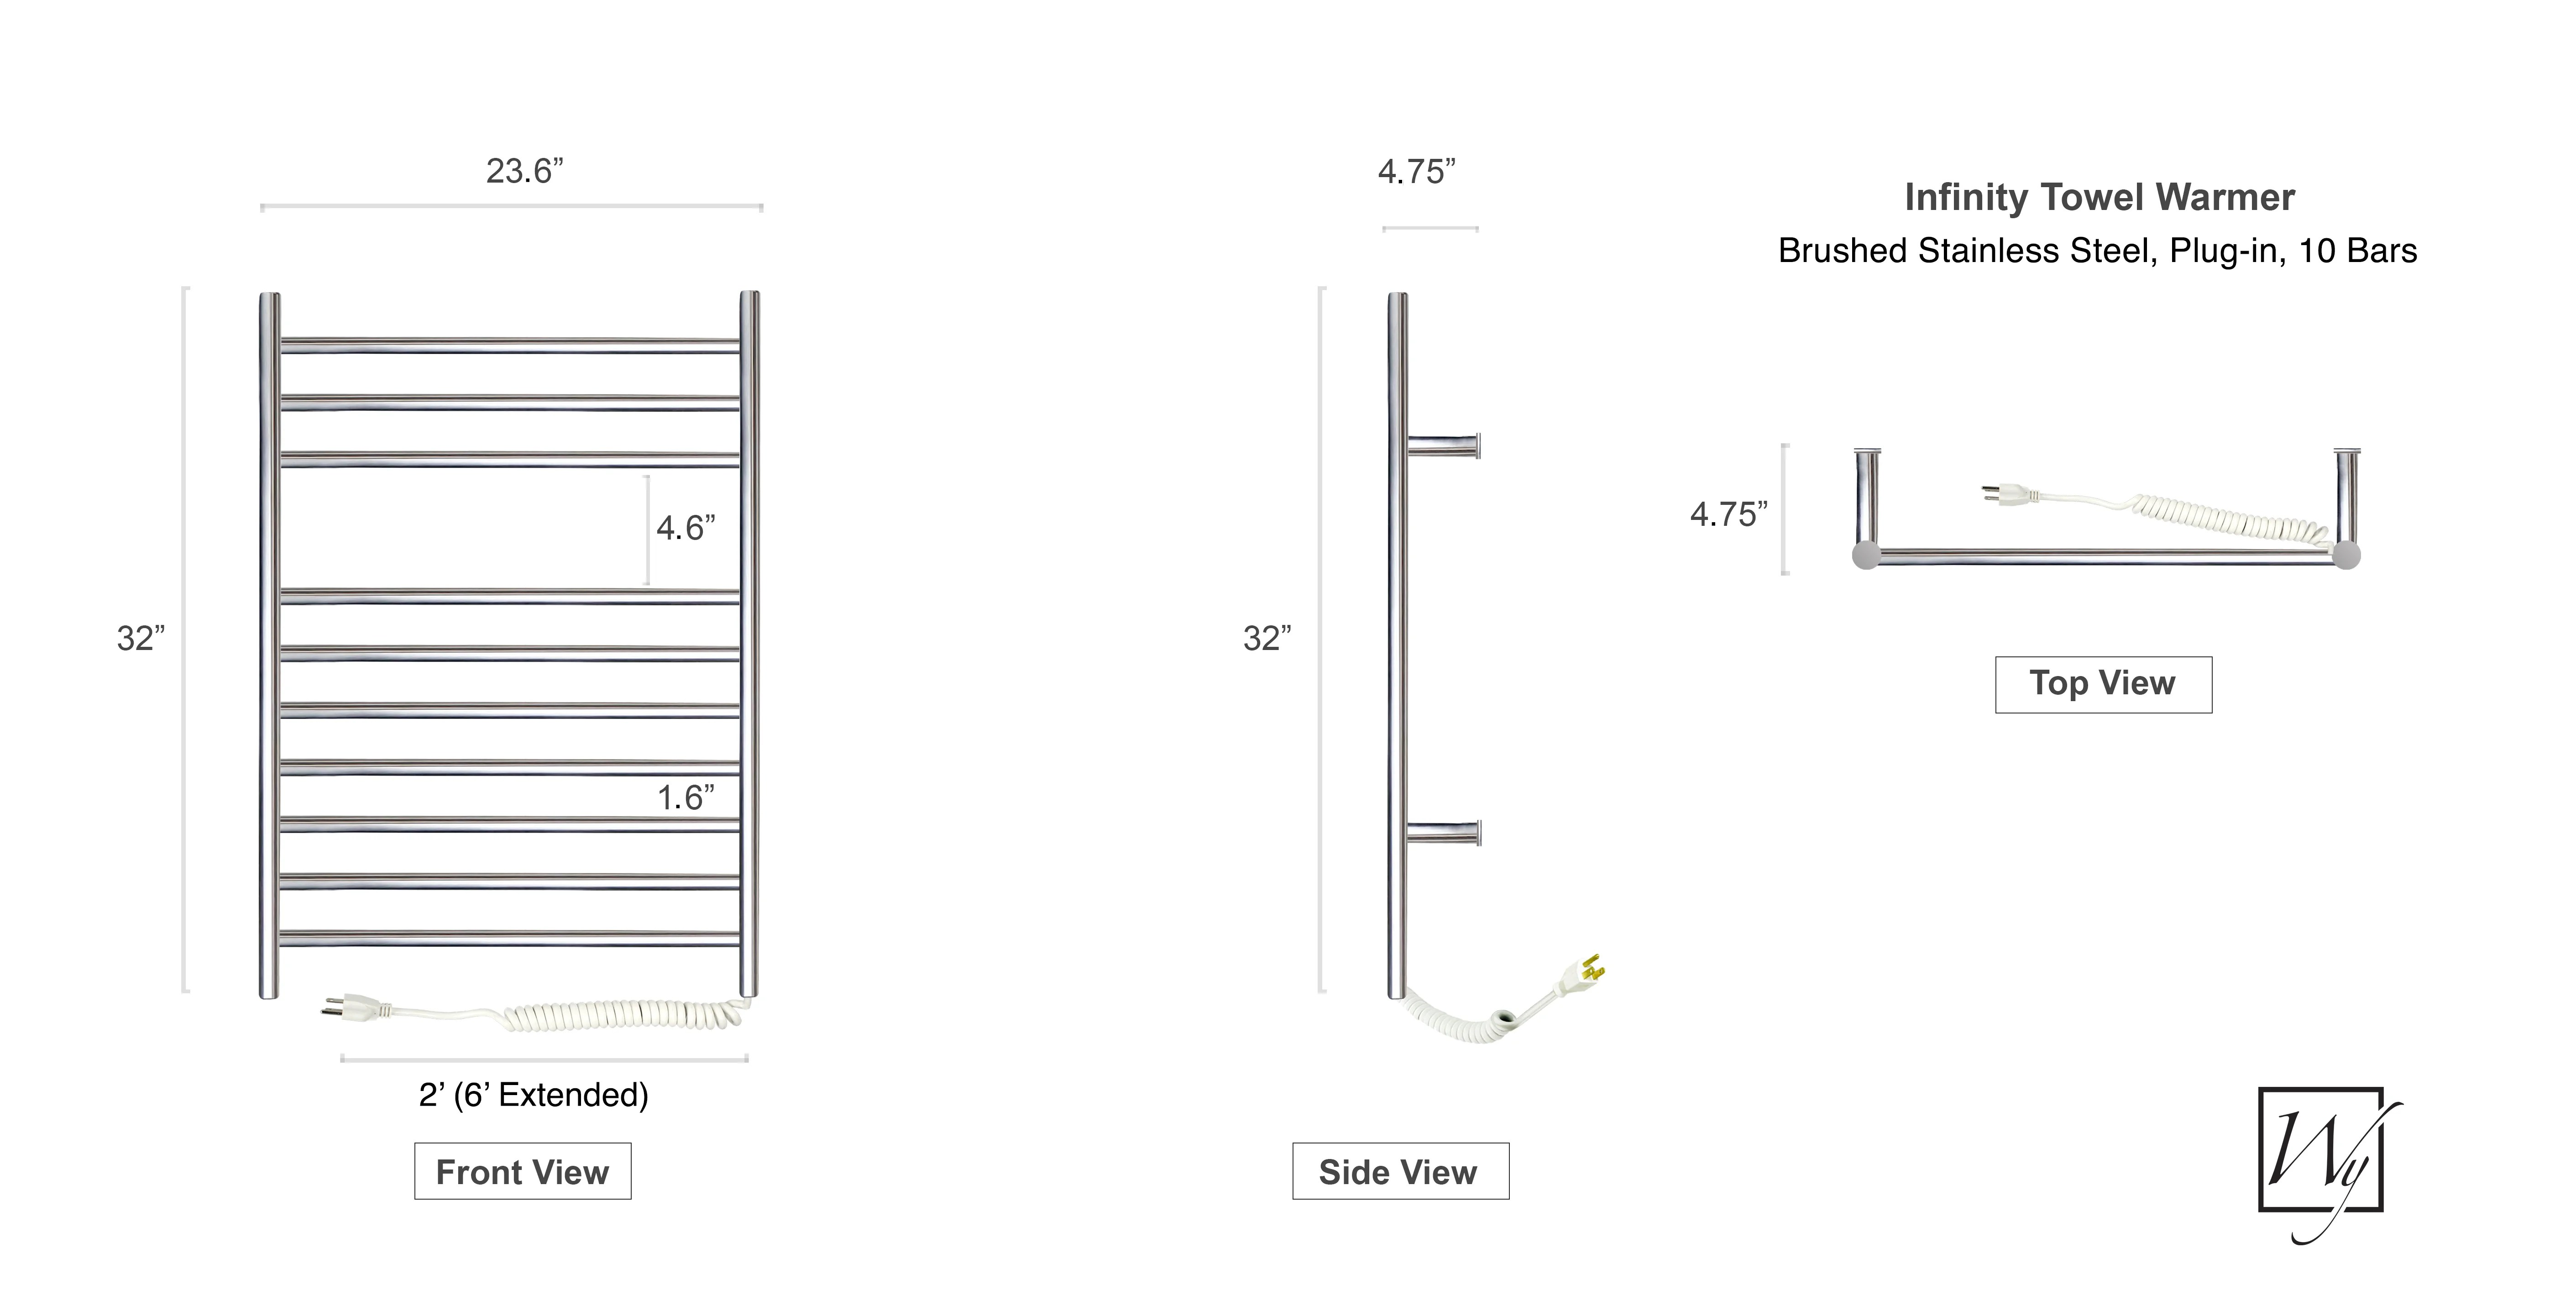 Tiger River Spas Hot Tub Wiring Diagram Wiring Diagram Experts